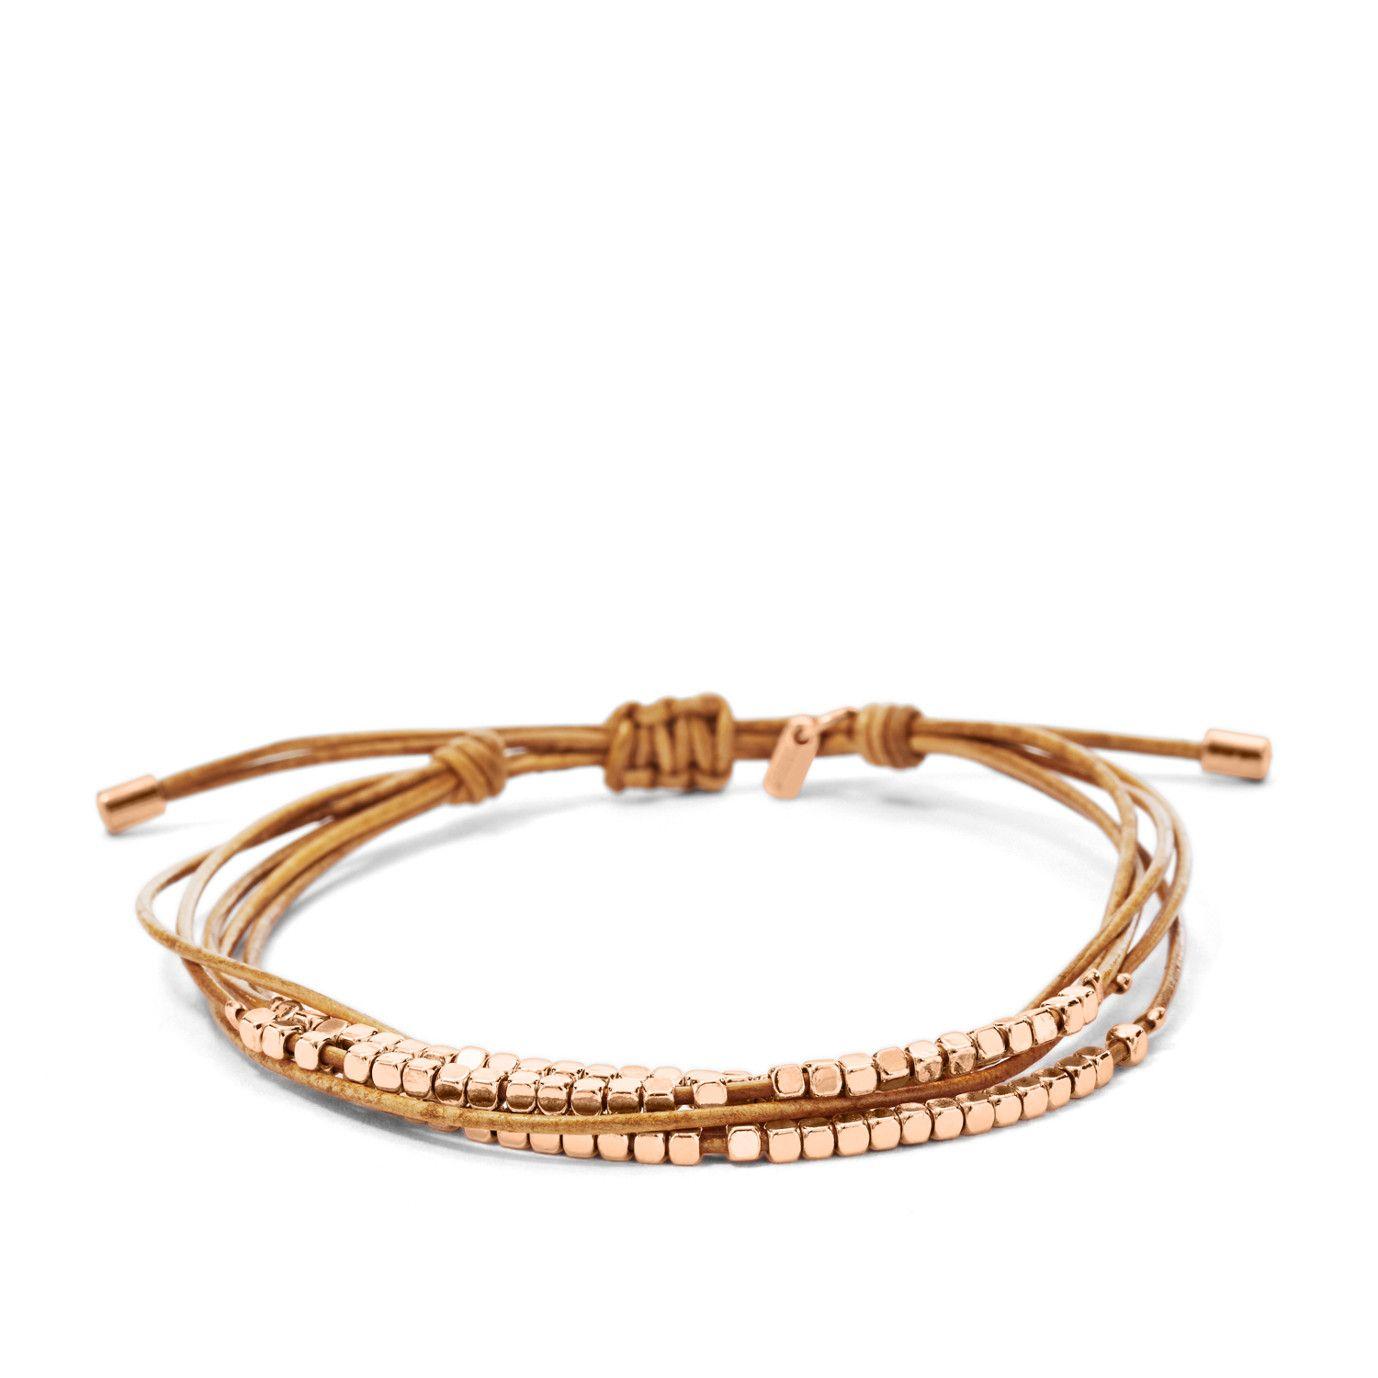 Damen Armband Dainty Rondel Slider JA6422 |FOSSIL®